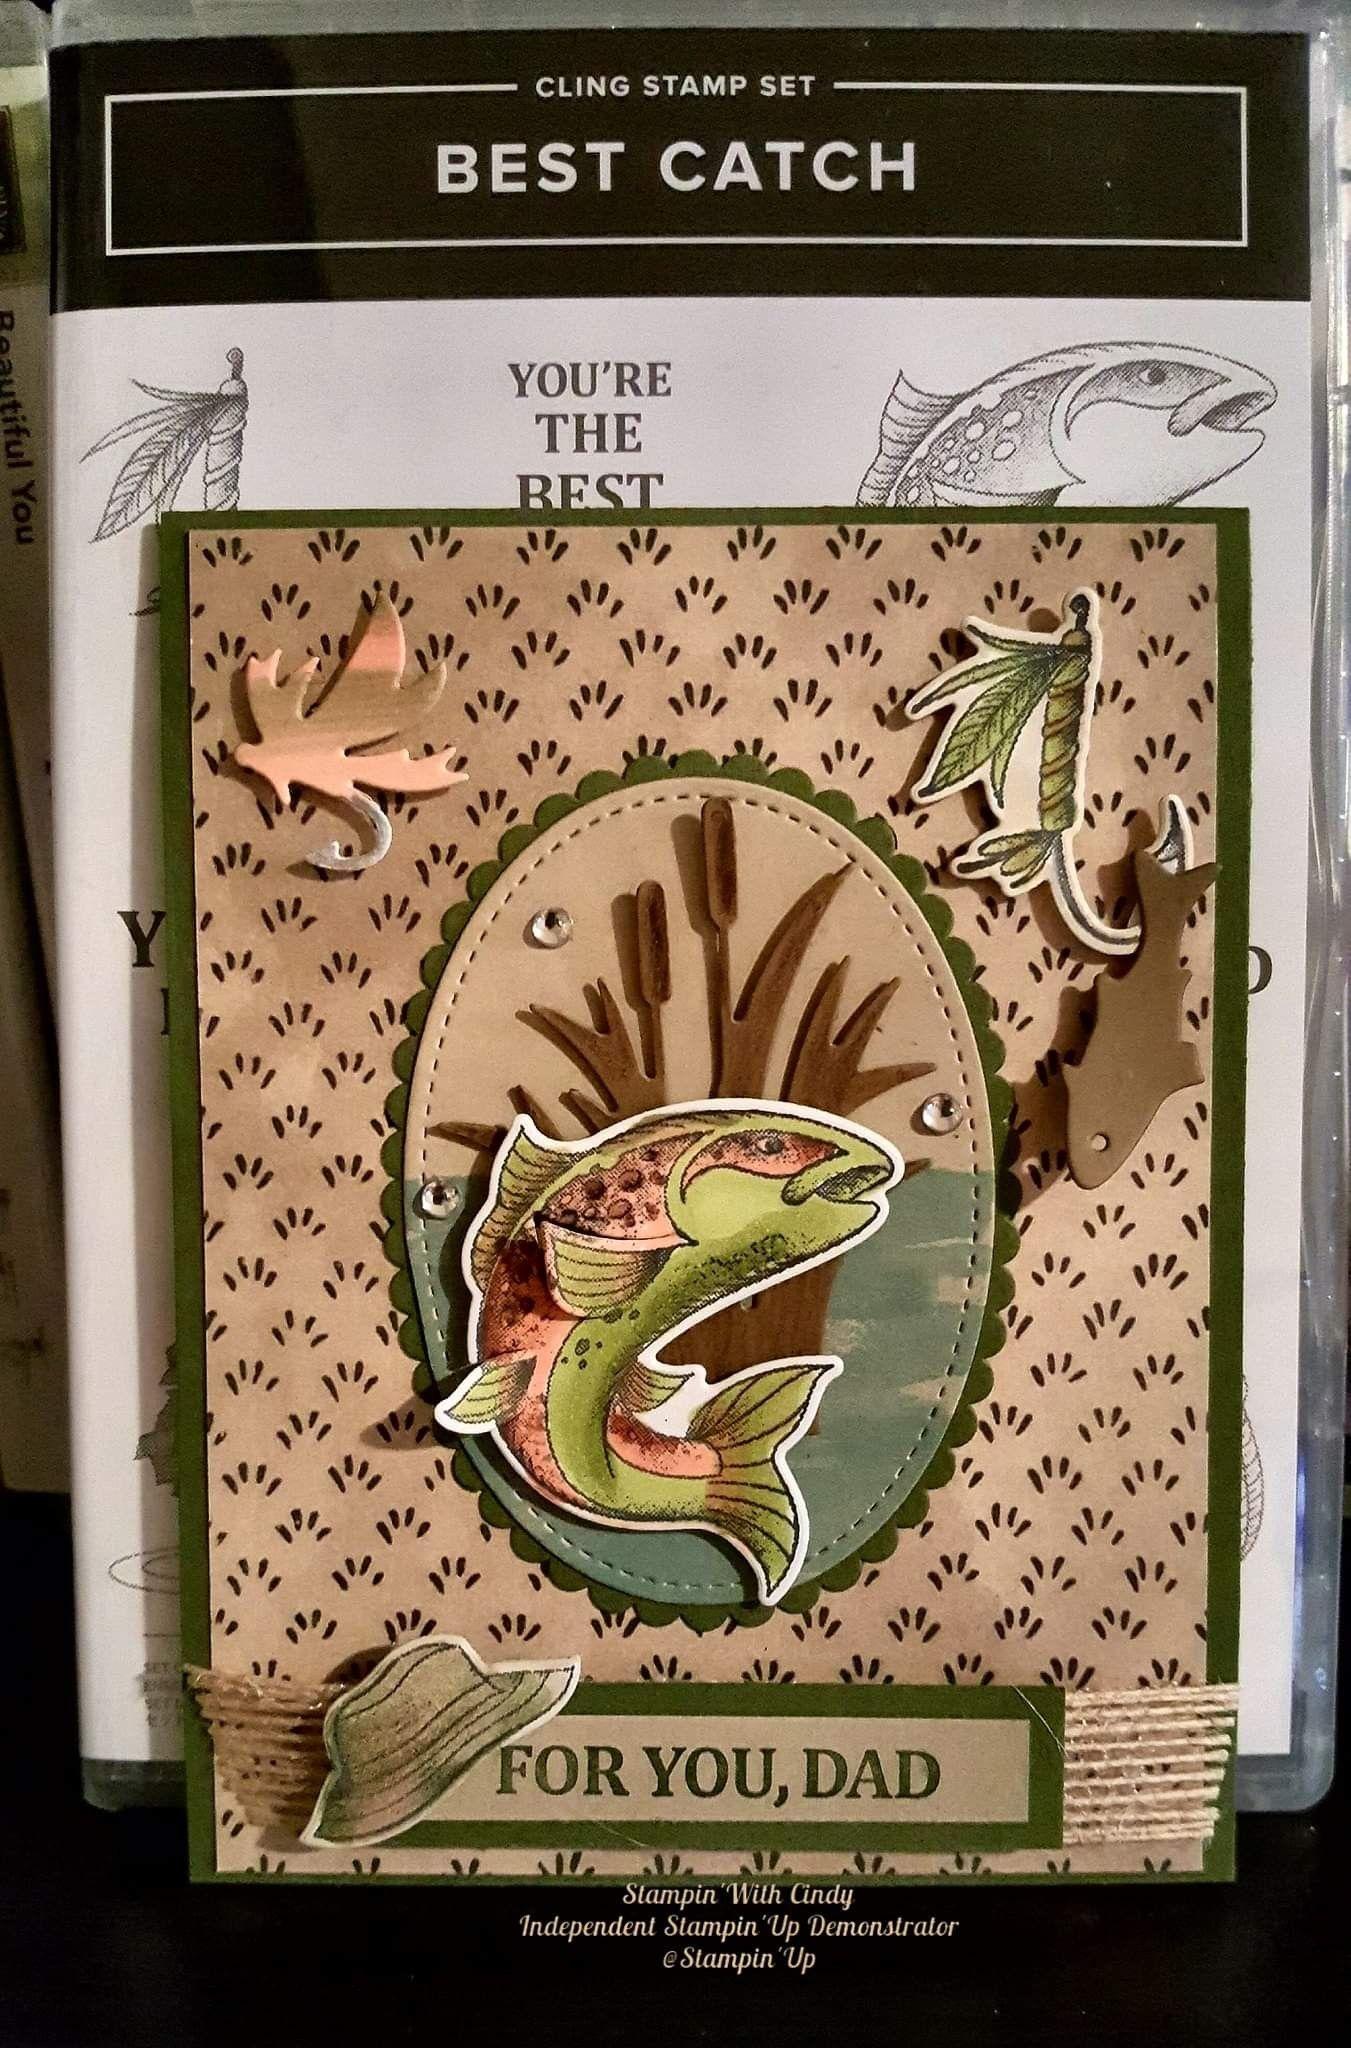 BASS HANDMADE BEST CATCH STAMPIN UP FISH BIRTHDAY CARD KIT FISHERMAN